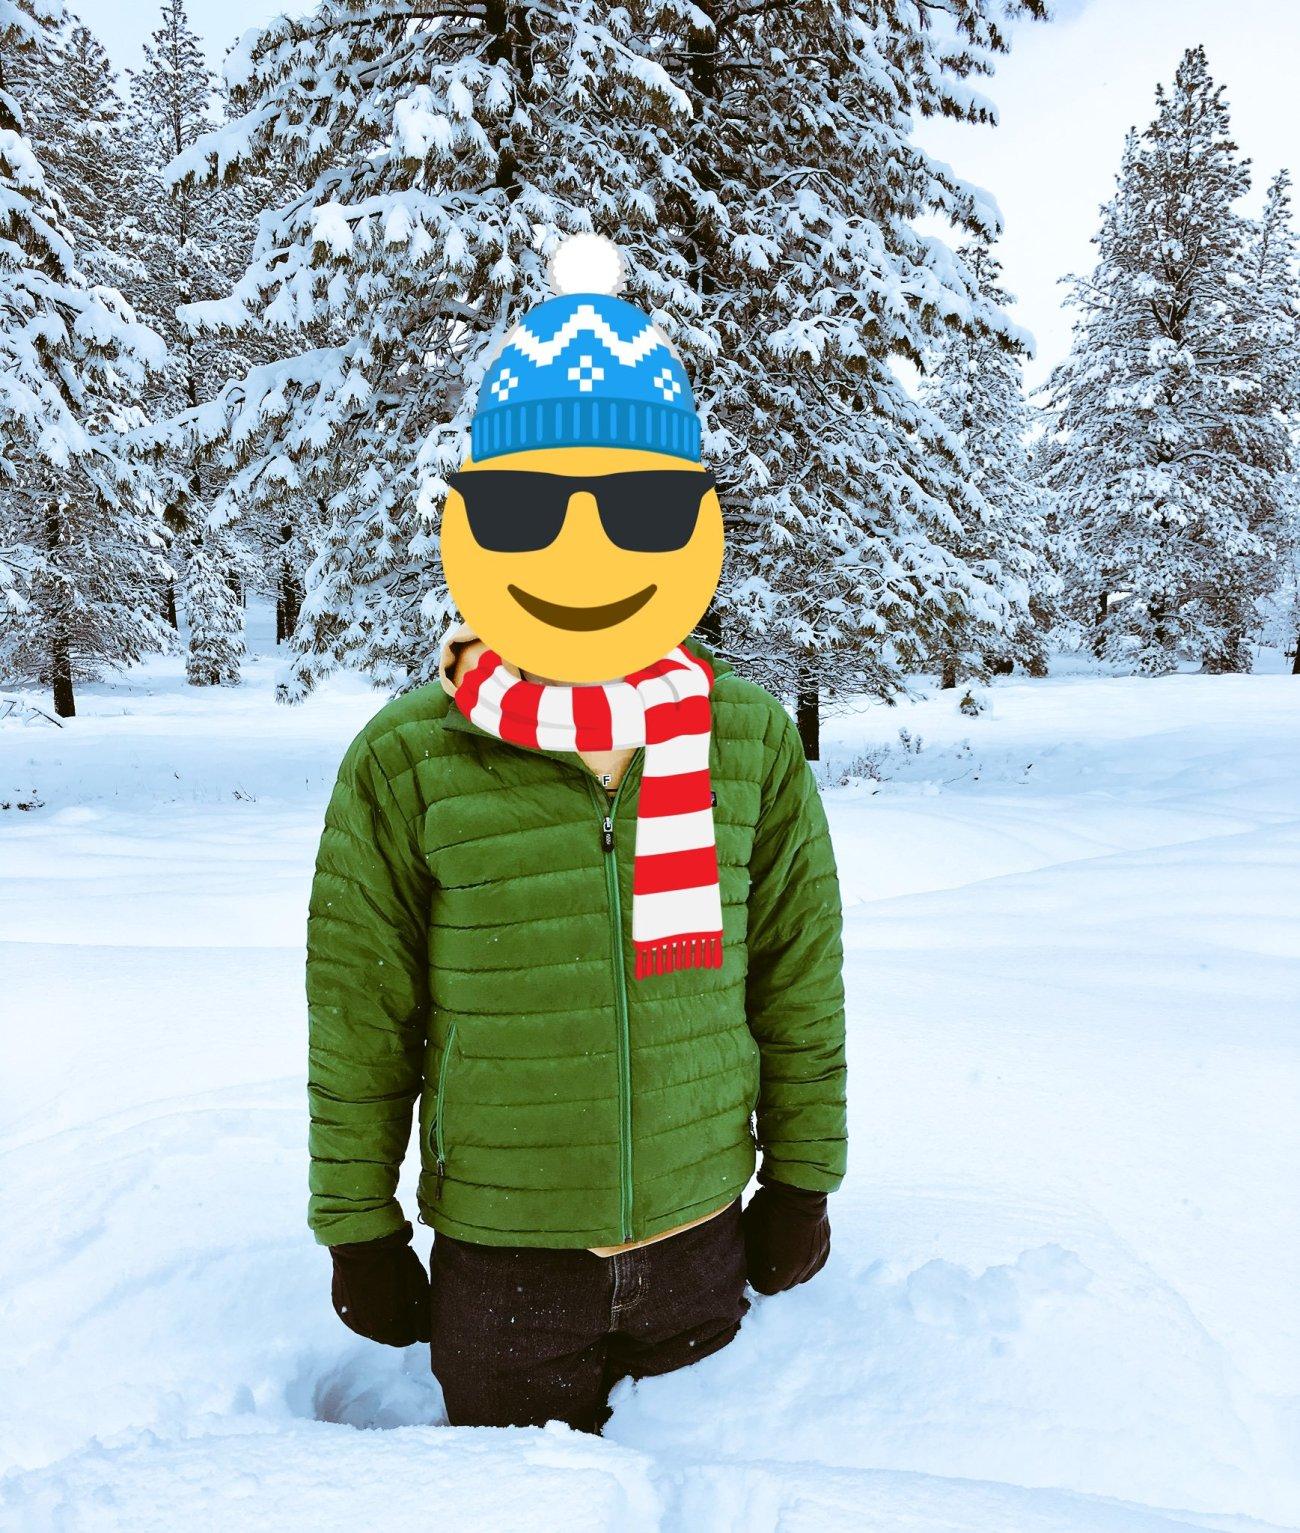 Mr. ONL standing in deep snow